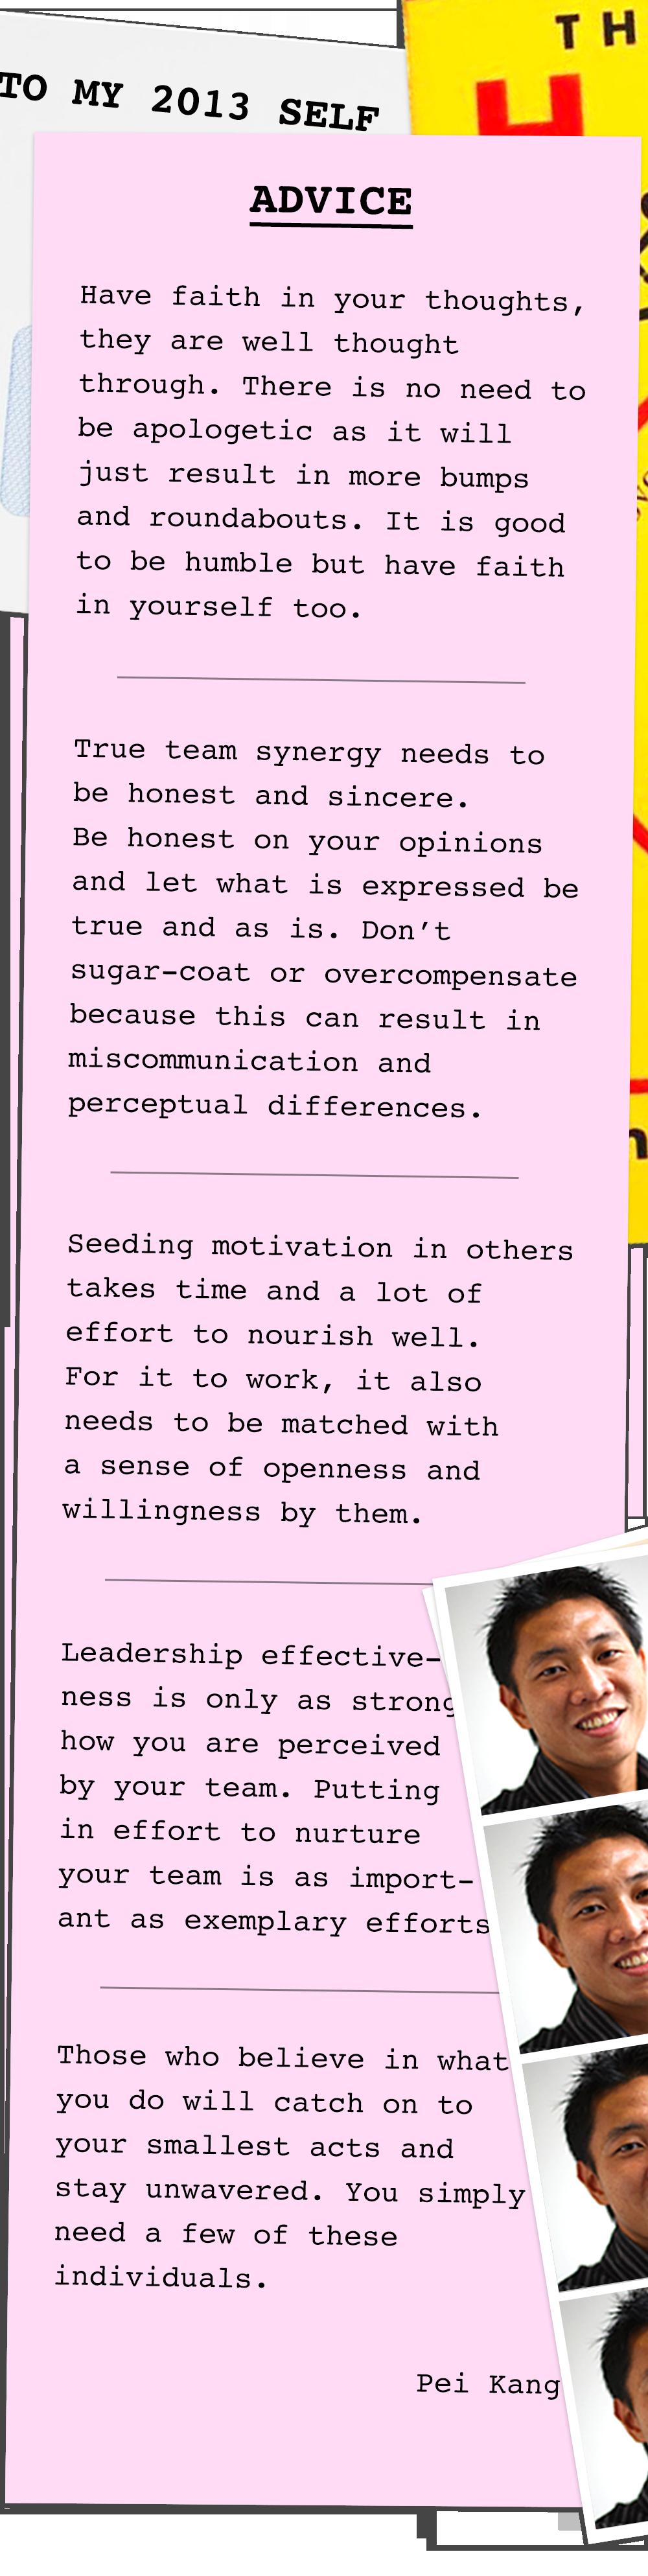 Creative Chronicles Series 2 Pei Kang Letter